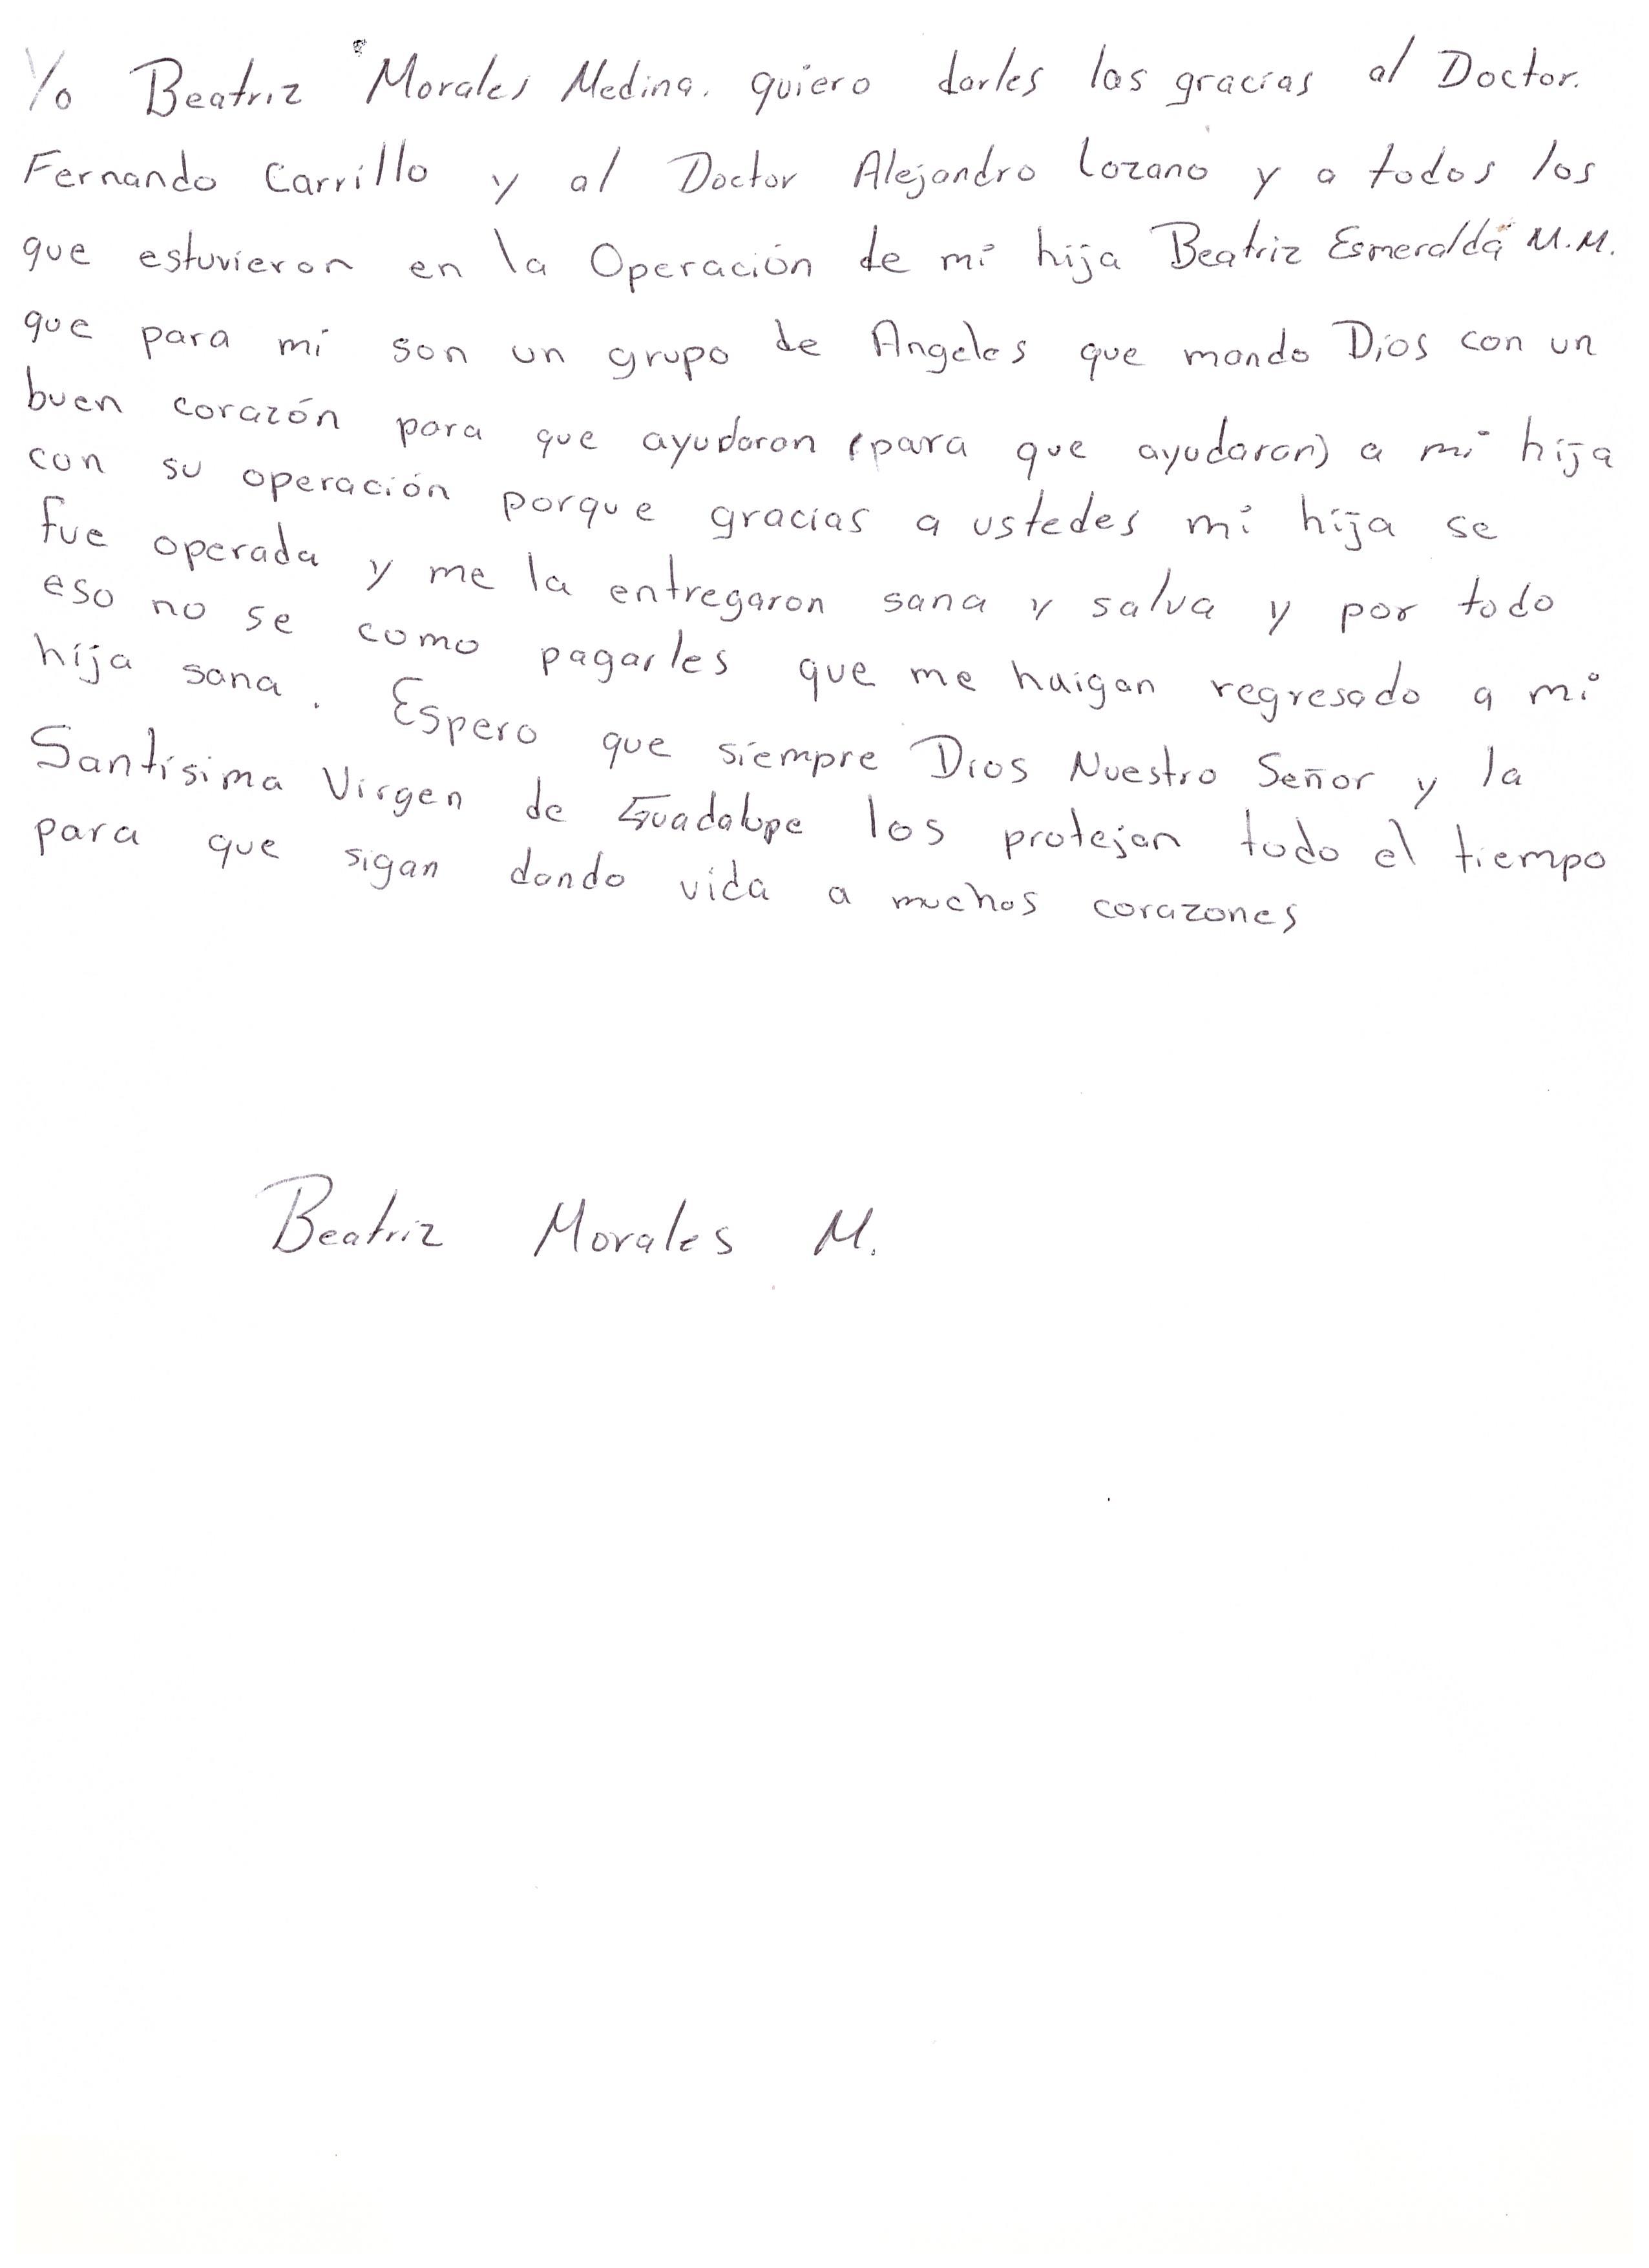 Carta mamá Betty